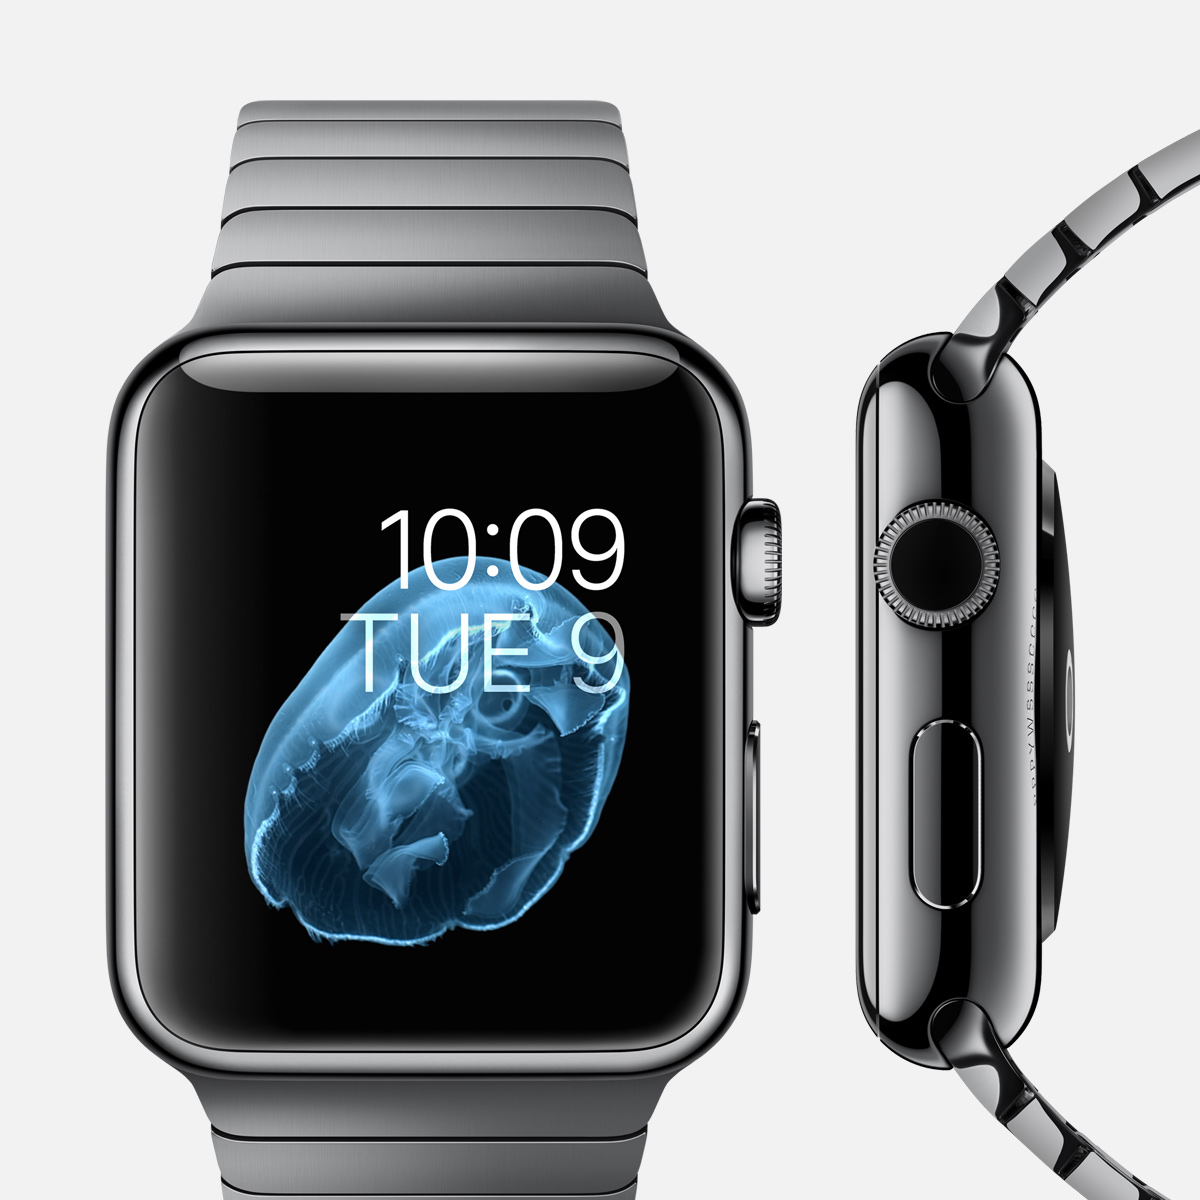 07909205-photo-apple-watch